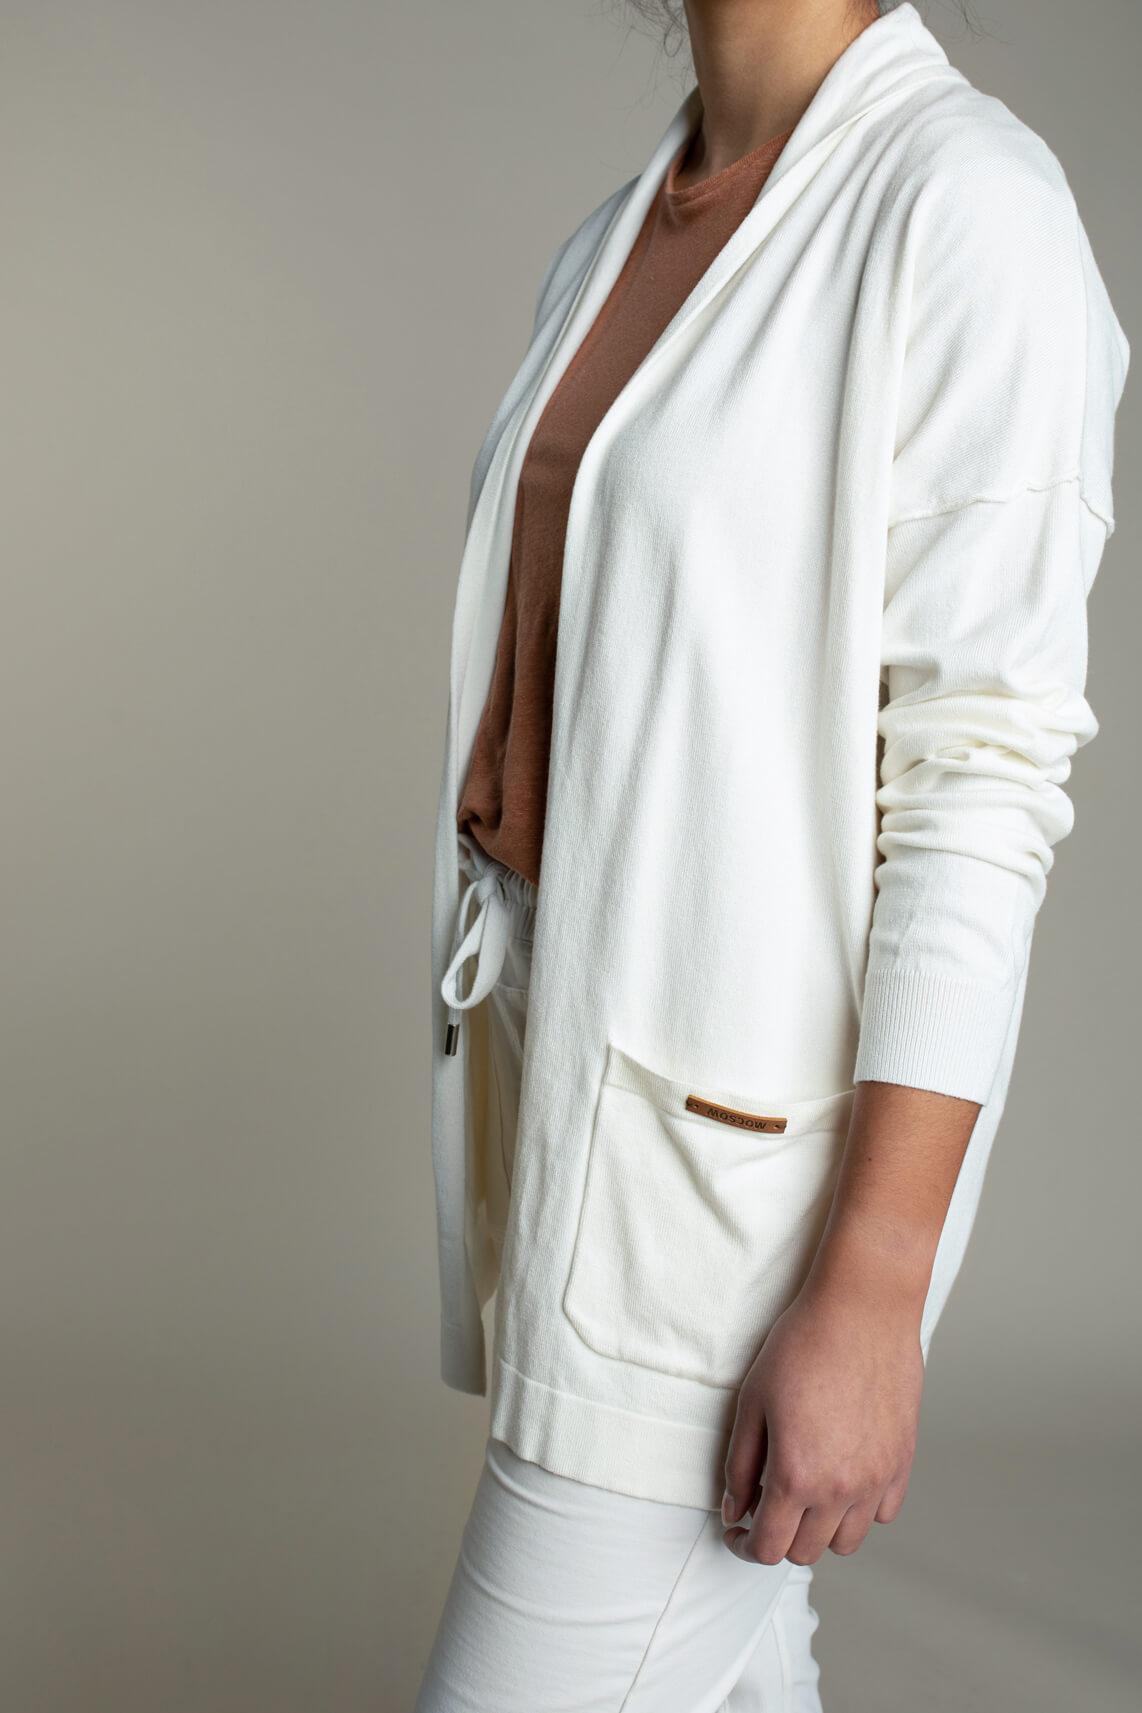 Moscow Dames Marvilous vest Wit